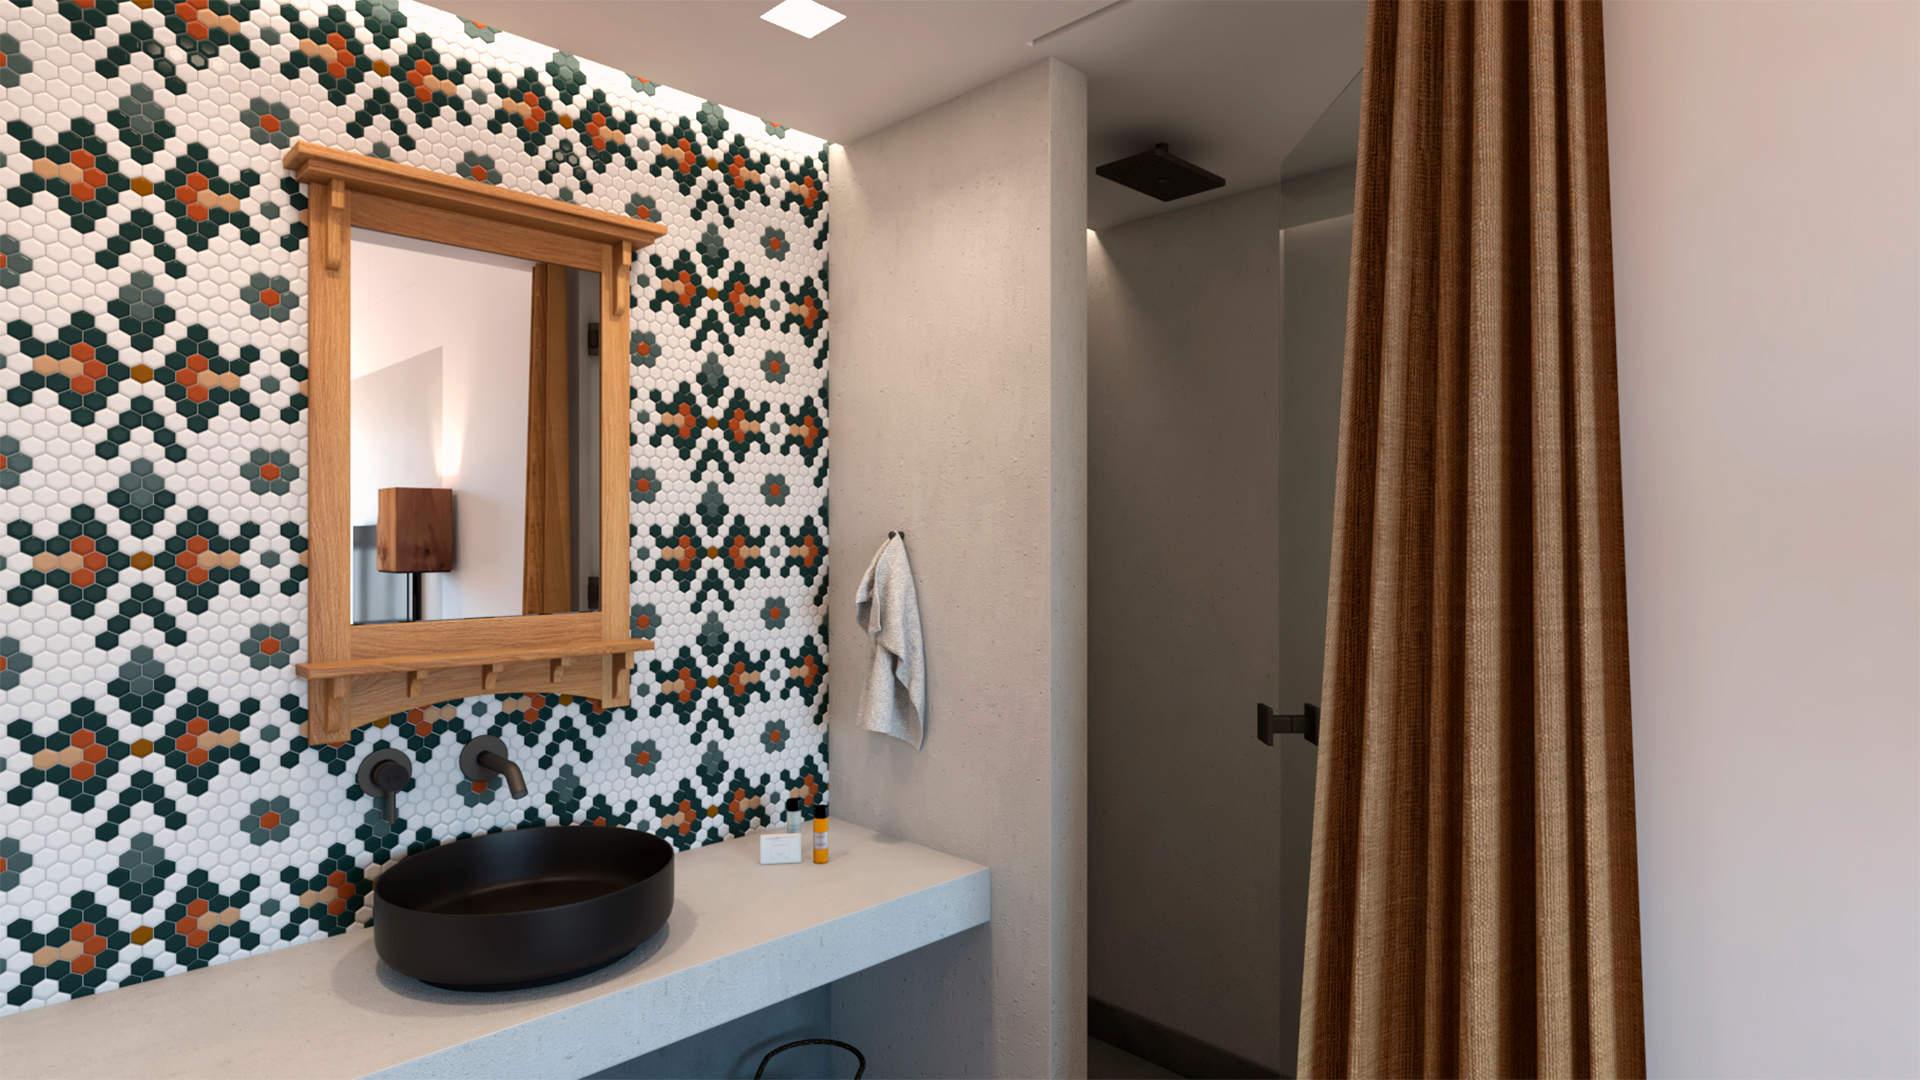 villas complex, interior design, bathroom of master bedroom. Συγκρότημα τουριστικών κατοικιών, εσωτερικός χώρος, μπάνιο στο κύριο υπνοδωμάτιο.